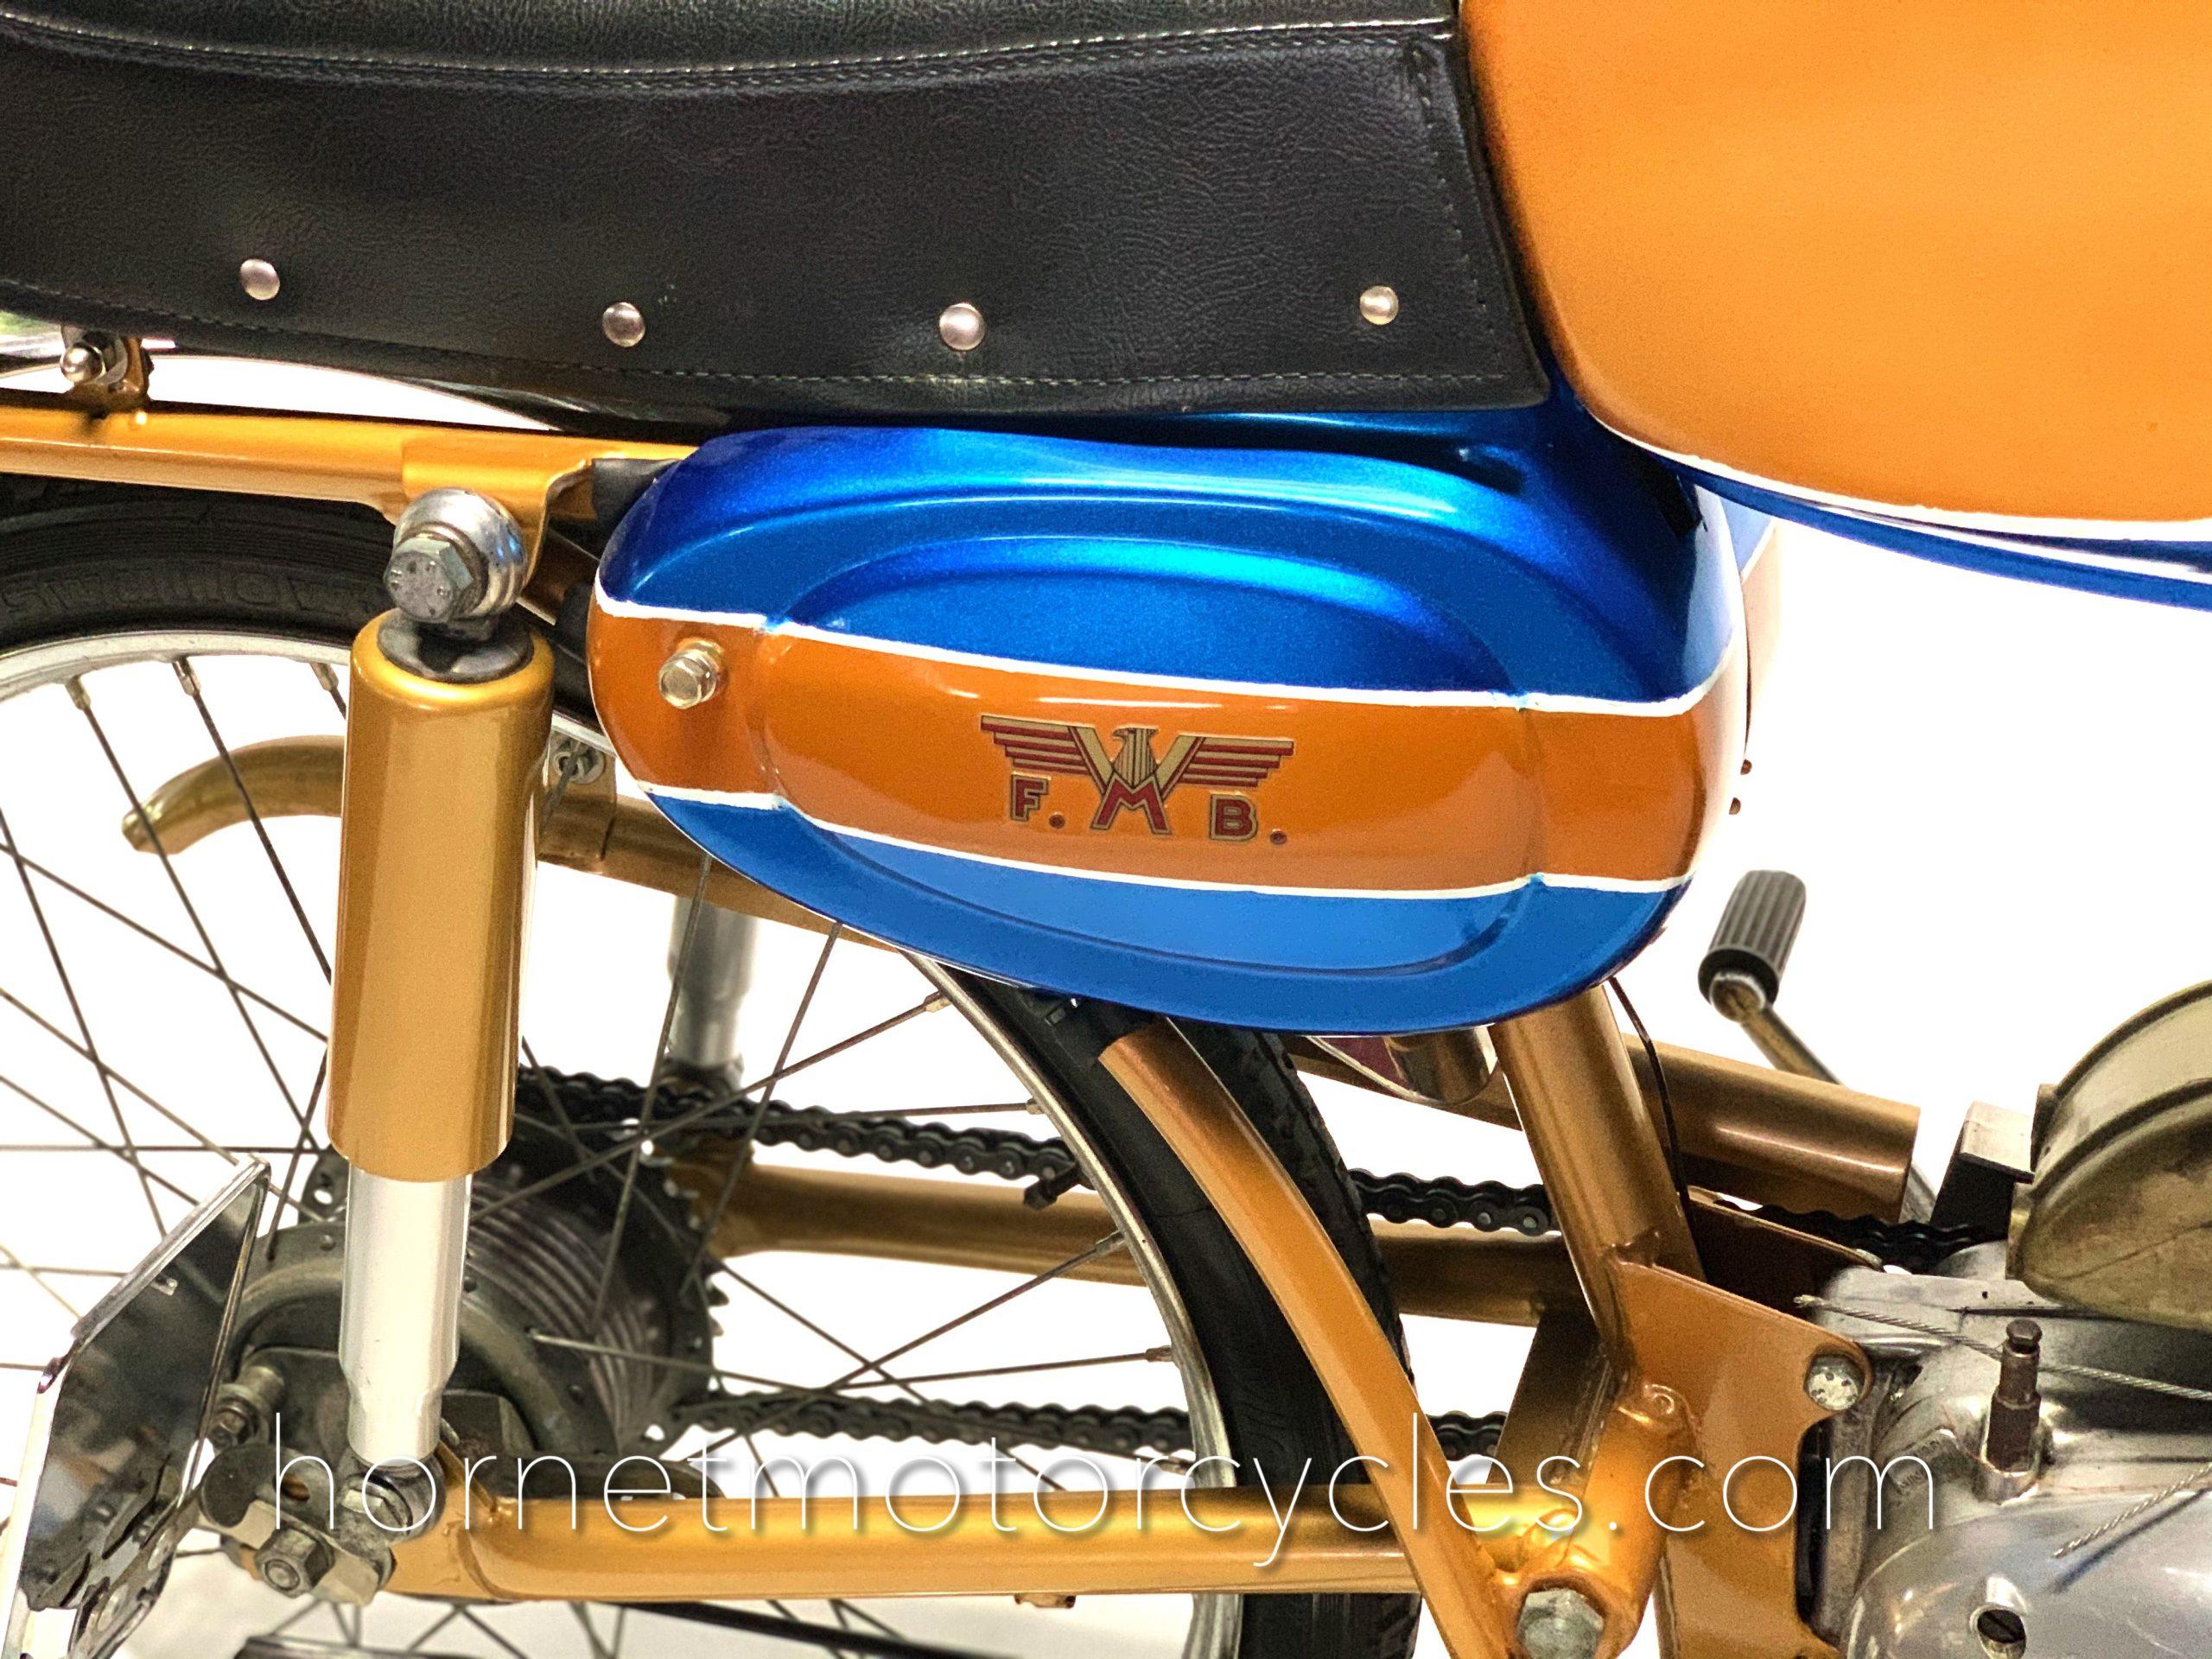 FMB Telaimotor Super Sport